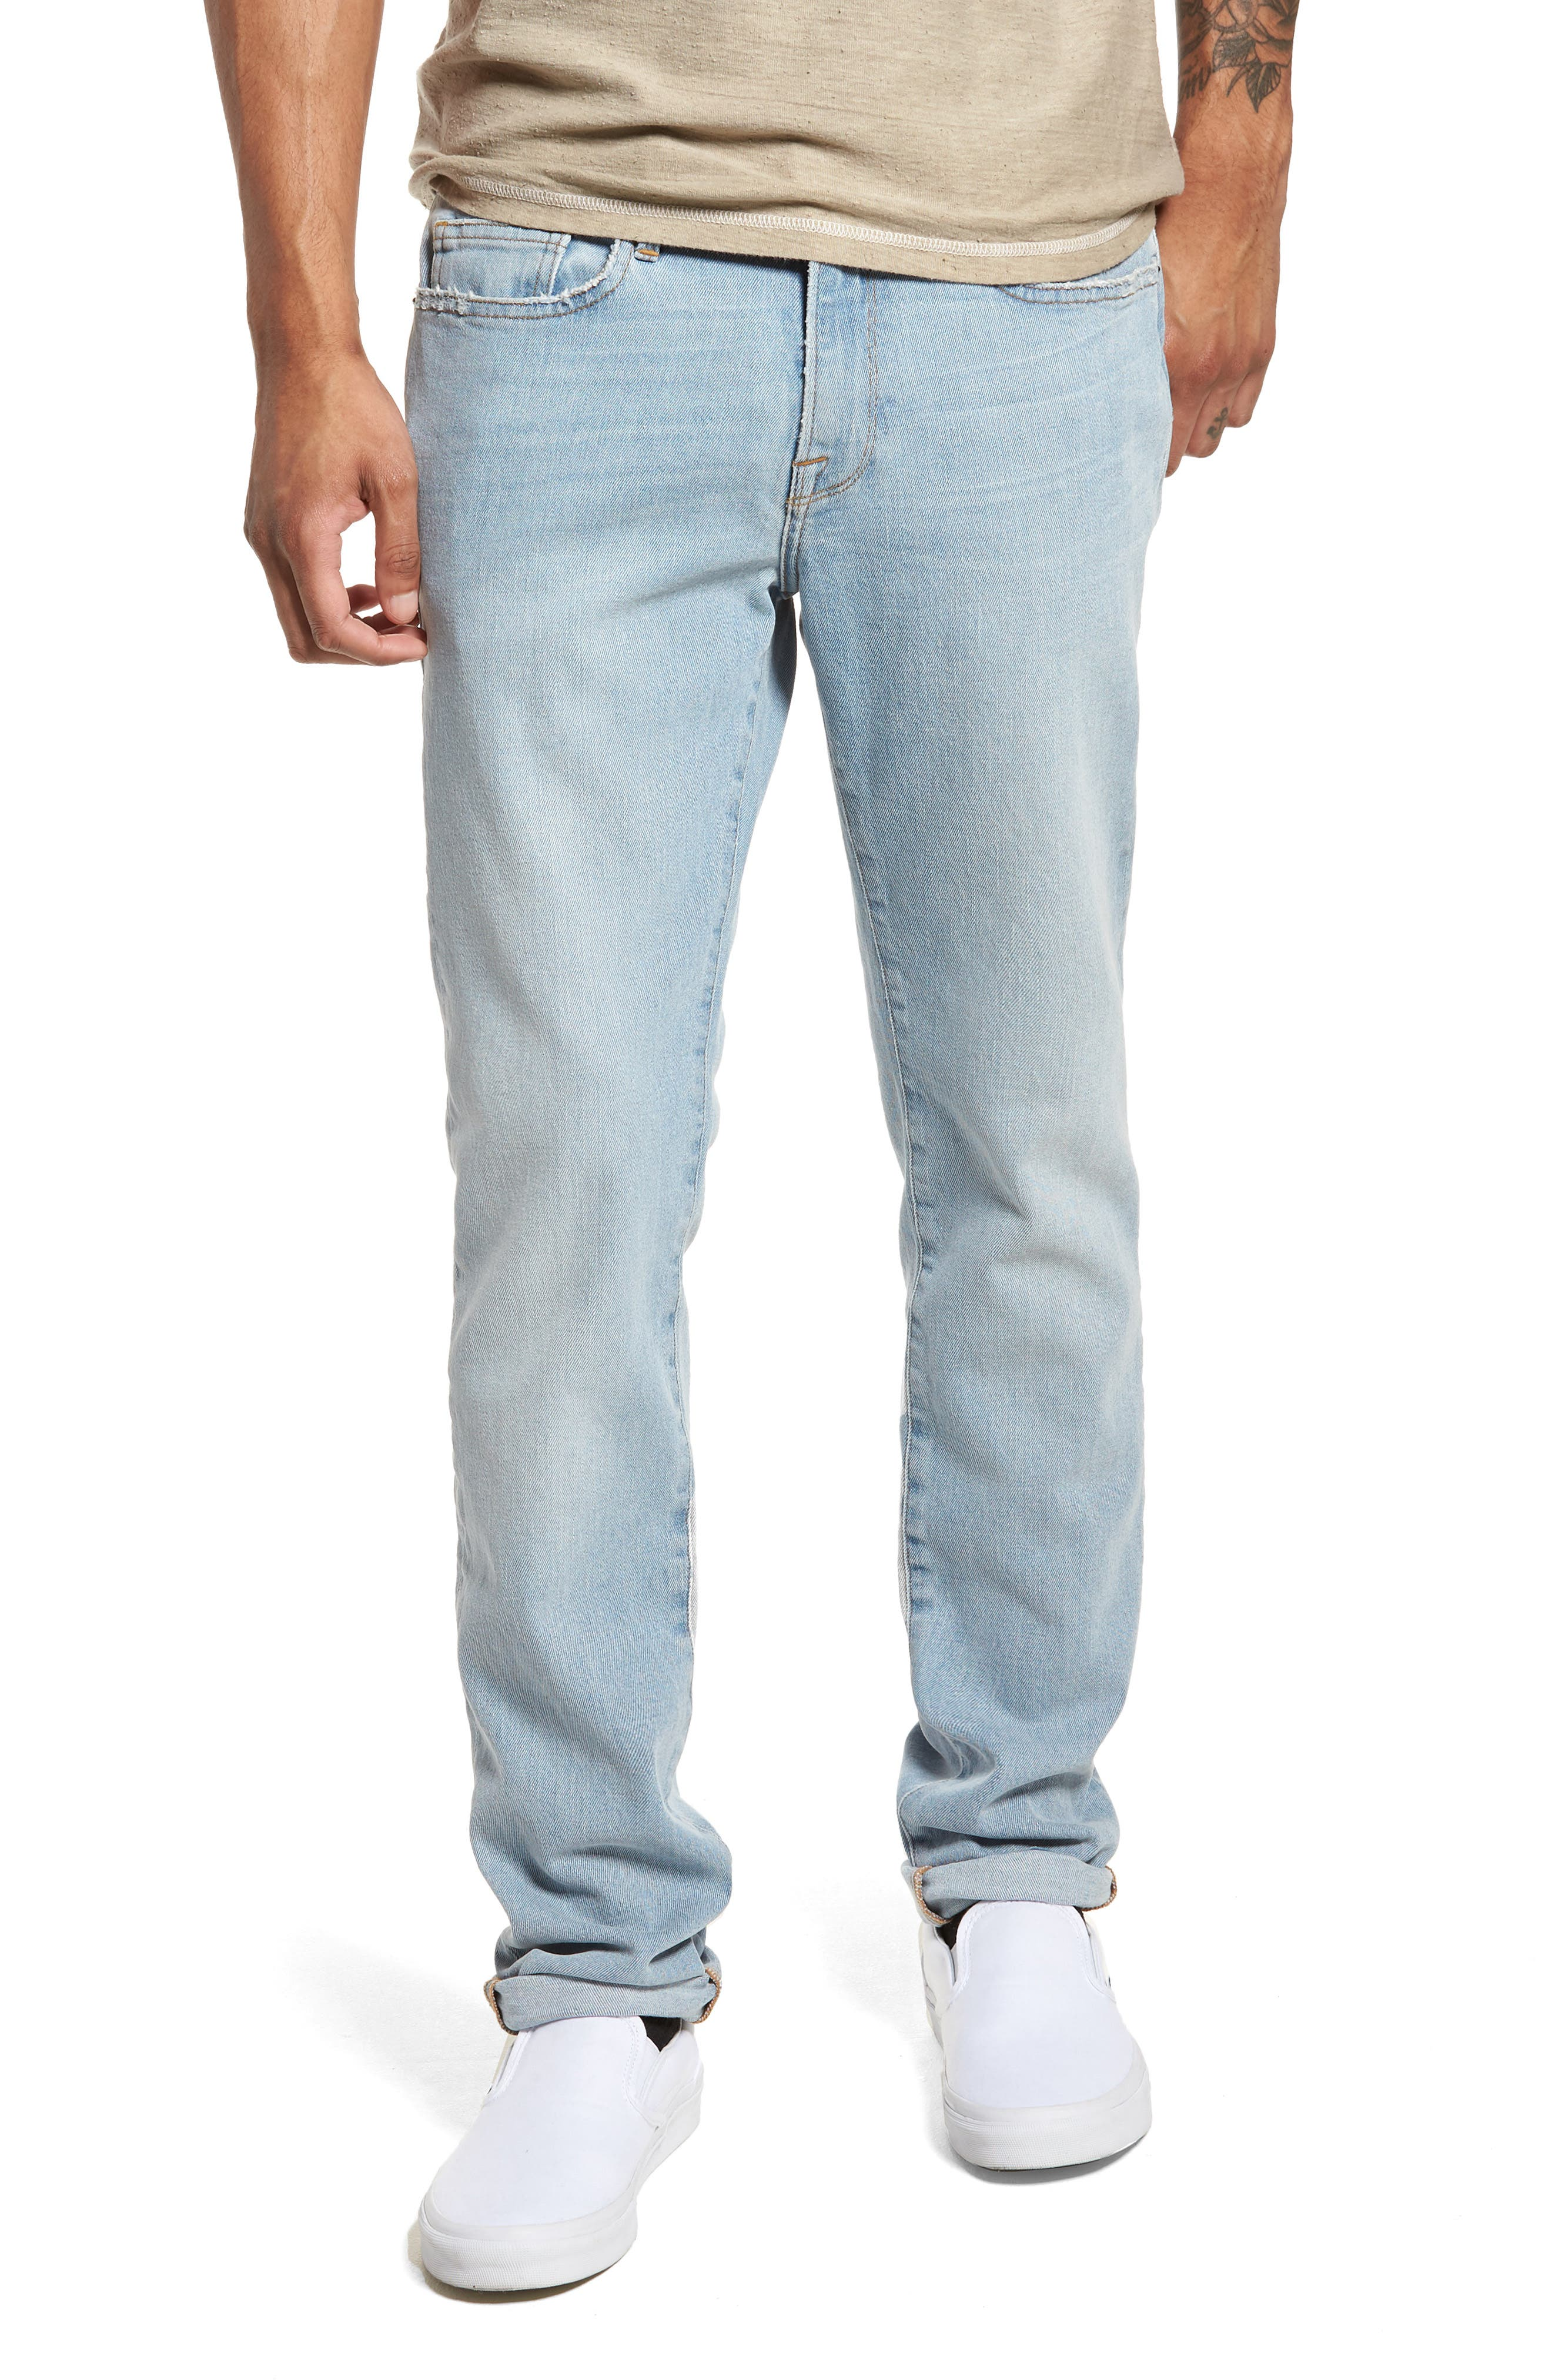 L'Homme Skinny Fit Jeans,                             Main thumbnail 1, color,                             Arnett